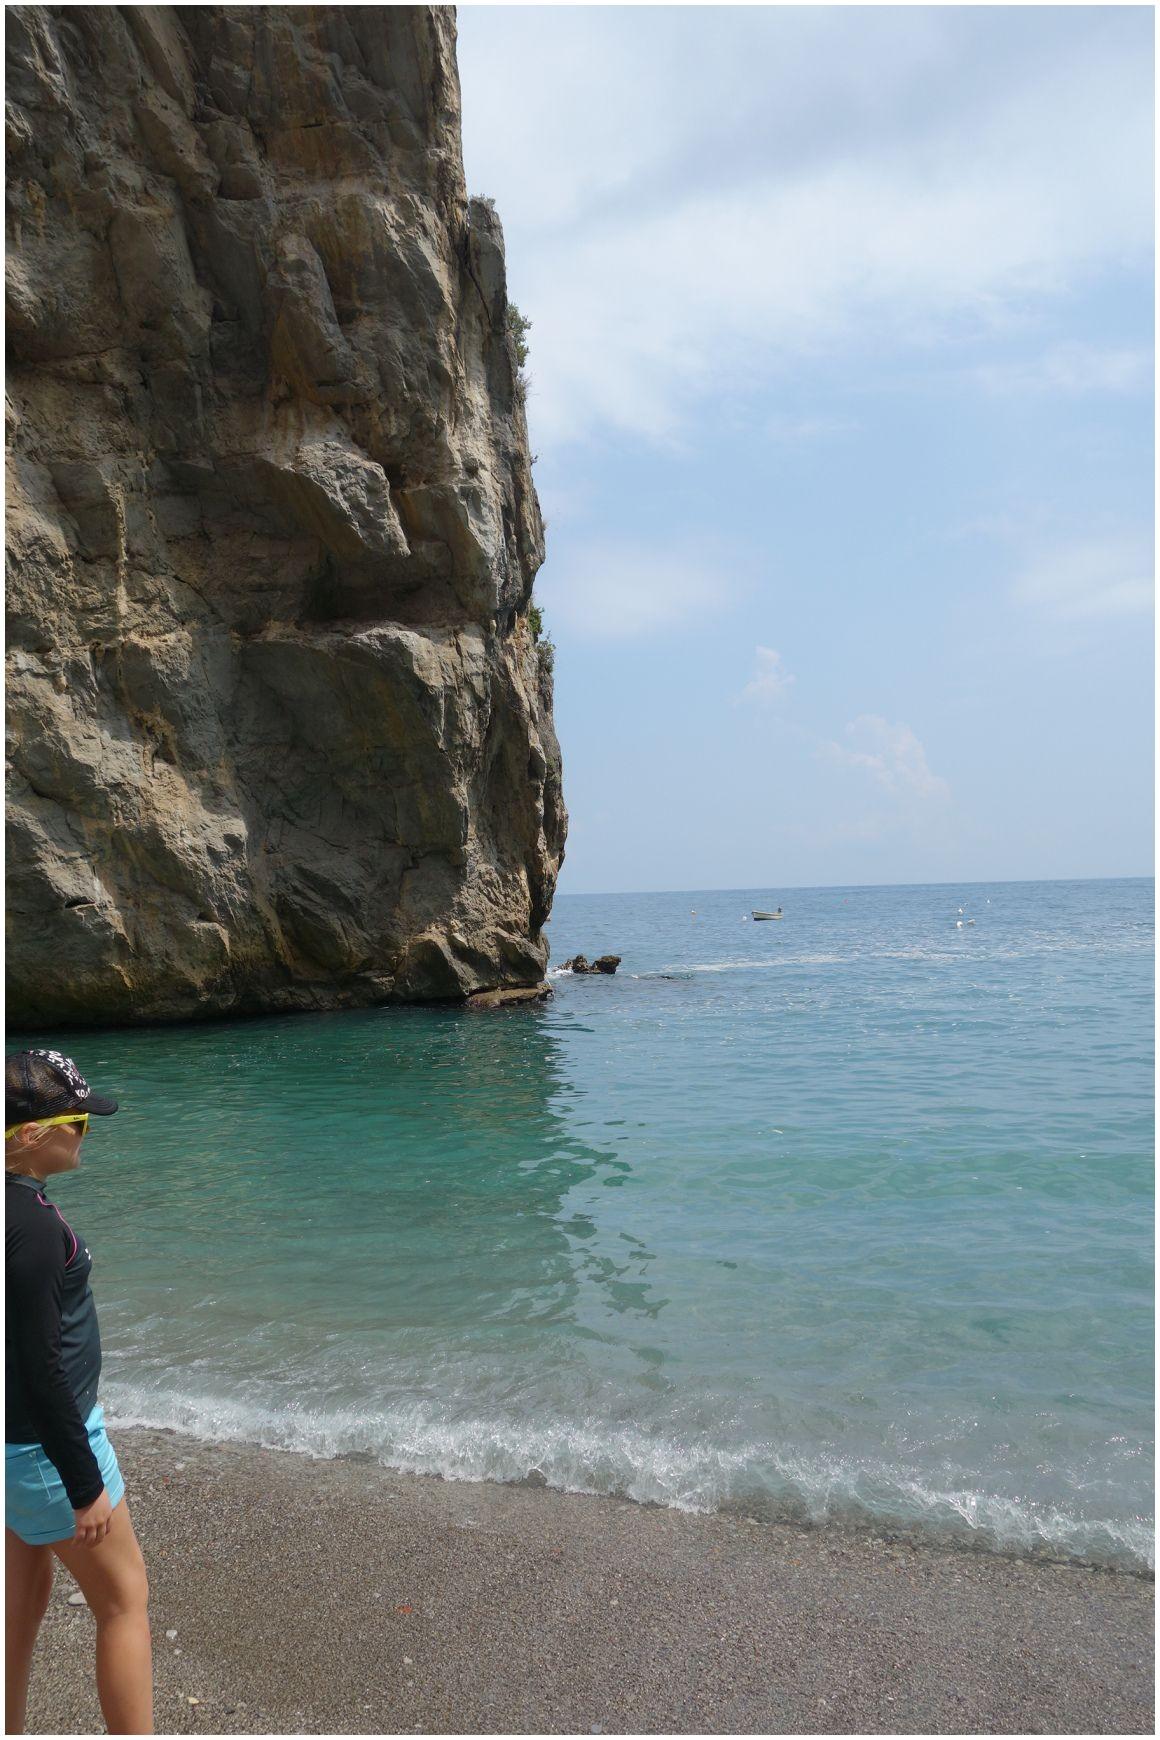 Marina di Praia beach Amalfi coast